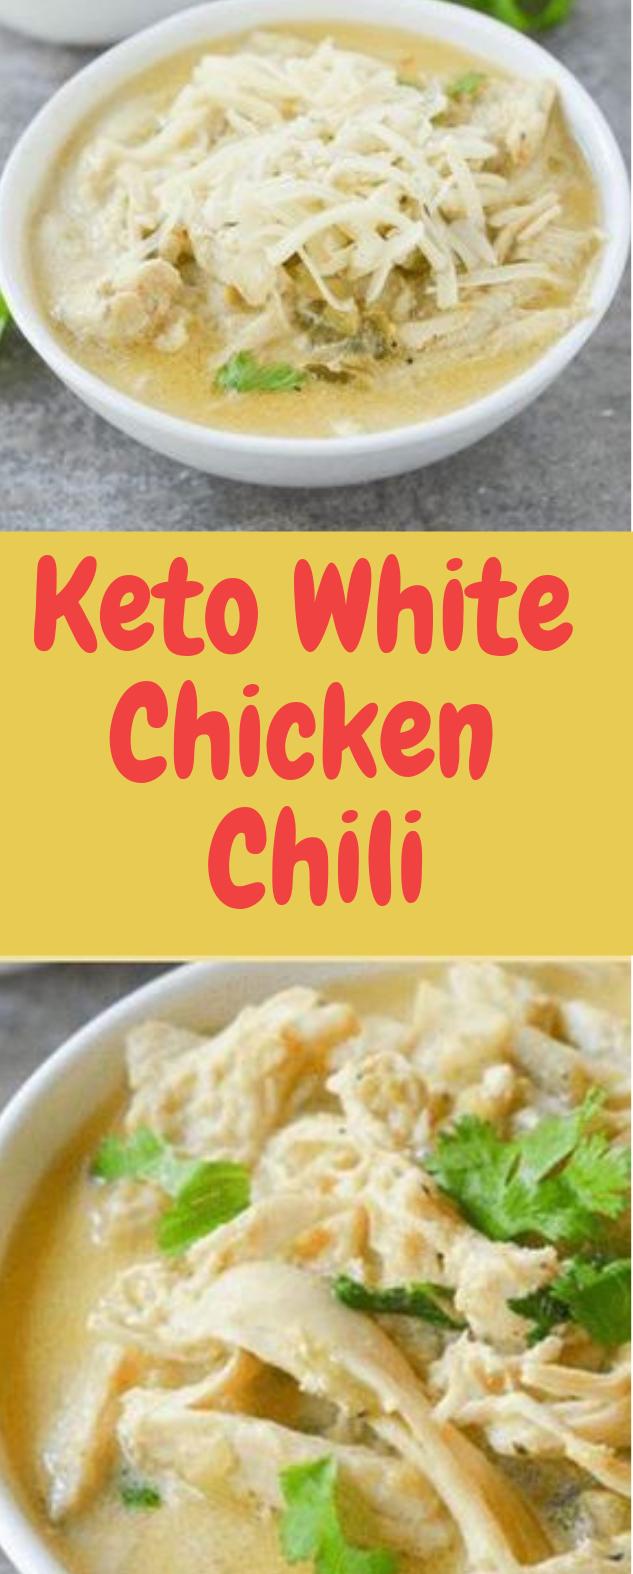 Keto White Chicken Chili #foods #eat healthy